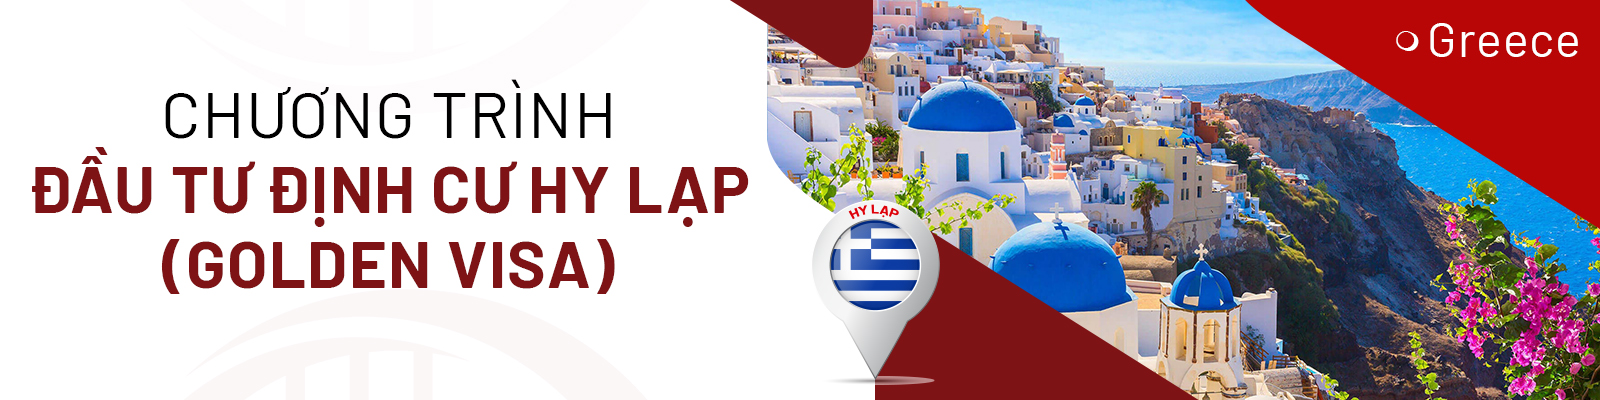 Greece Immigration